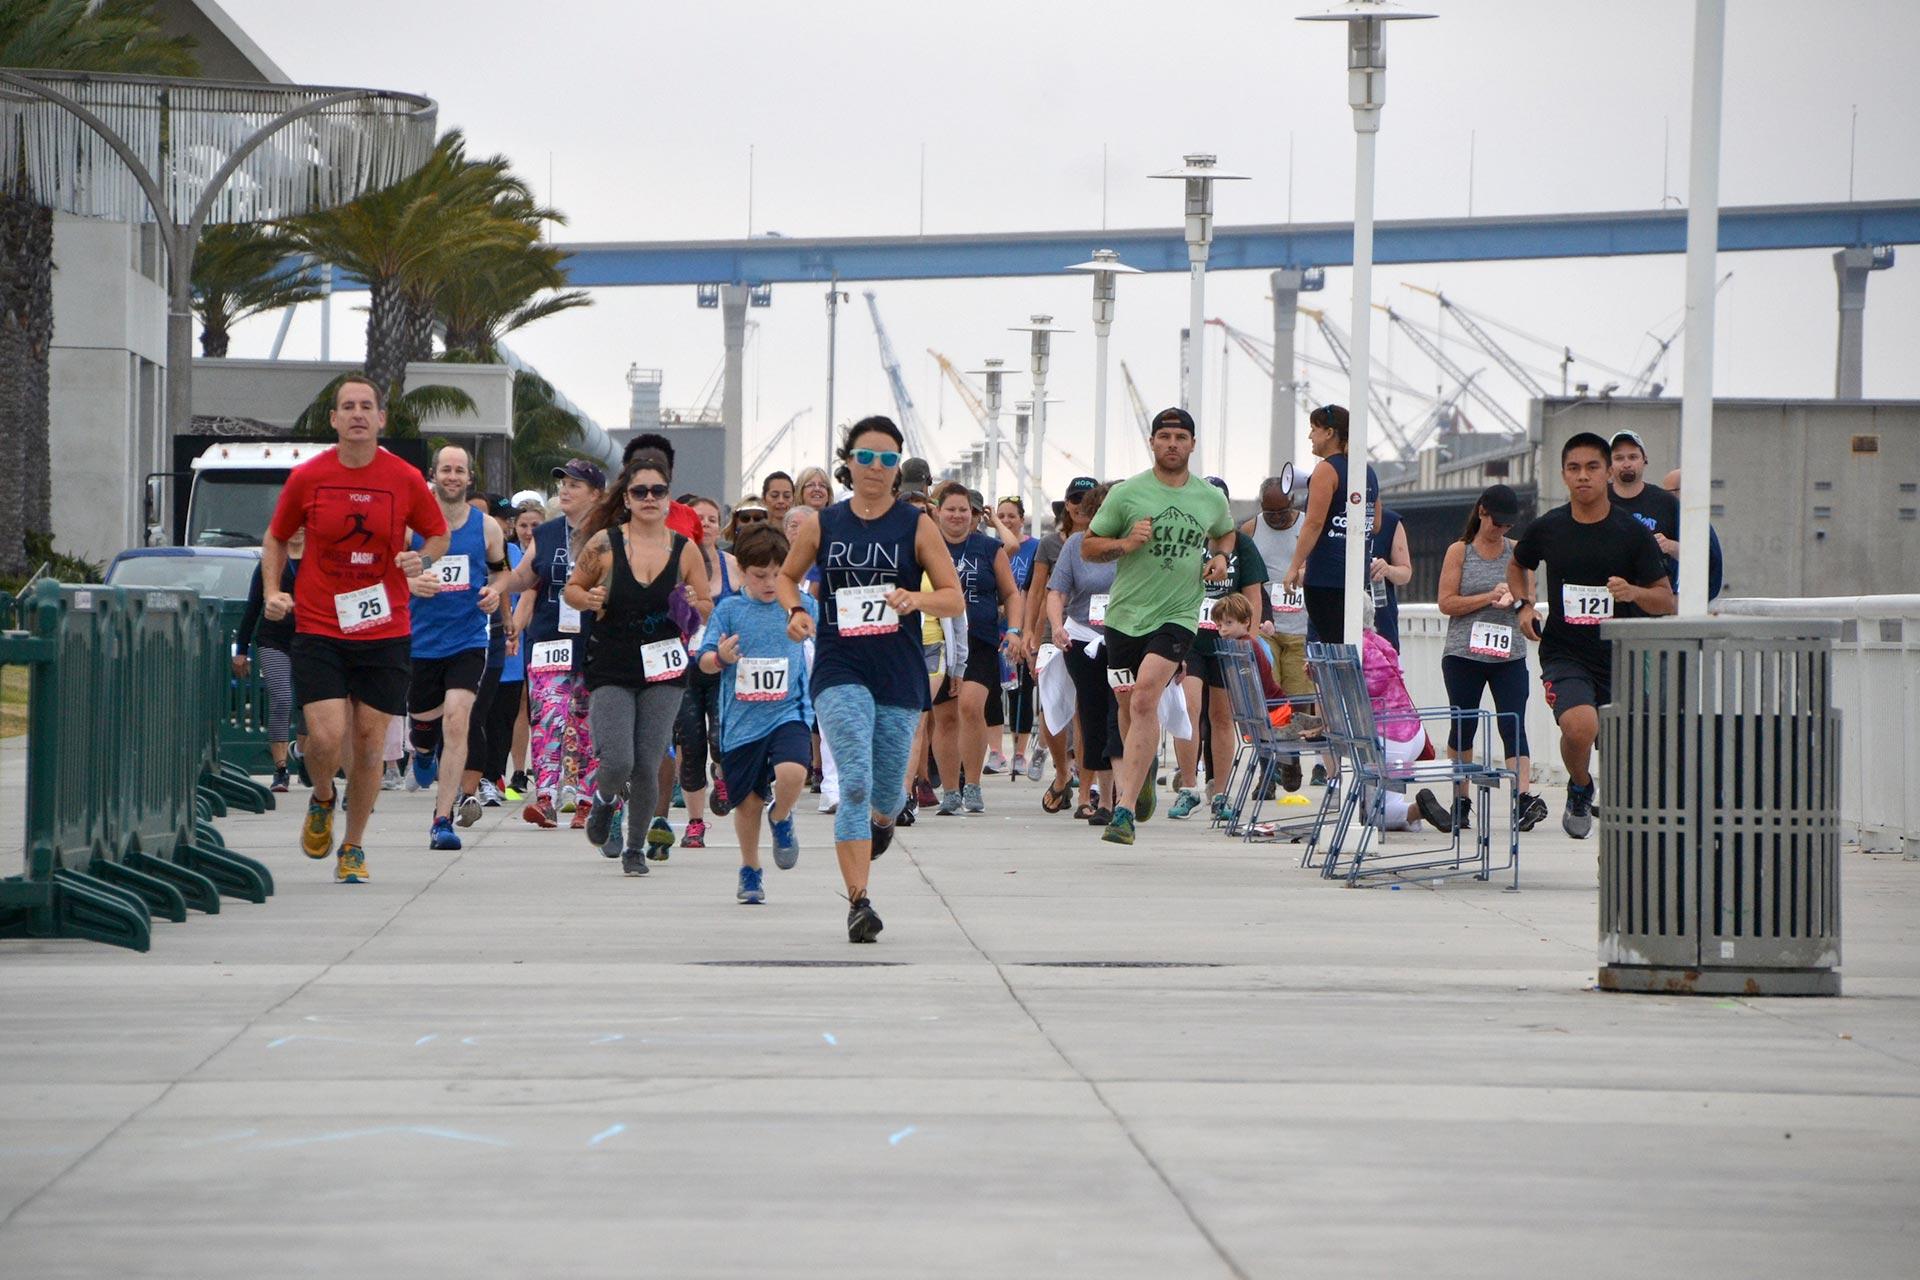 5K Run Series 2